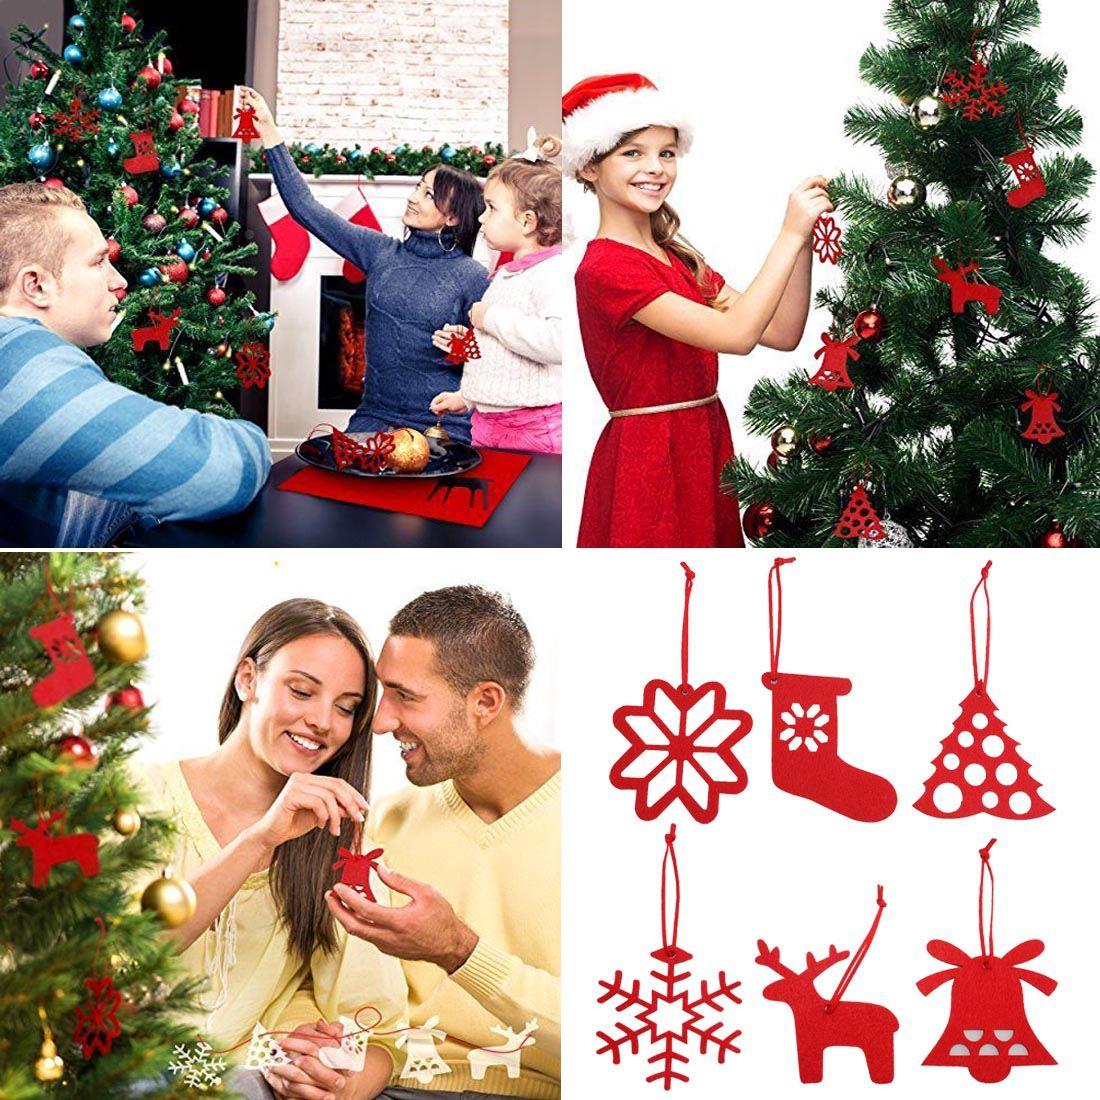 #B7141D Feutre Décorations De Noël Pendant Ornements Arbre De Noël  5409 decorations de noel en gros 1100x1100 px @ aertt.com